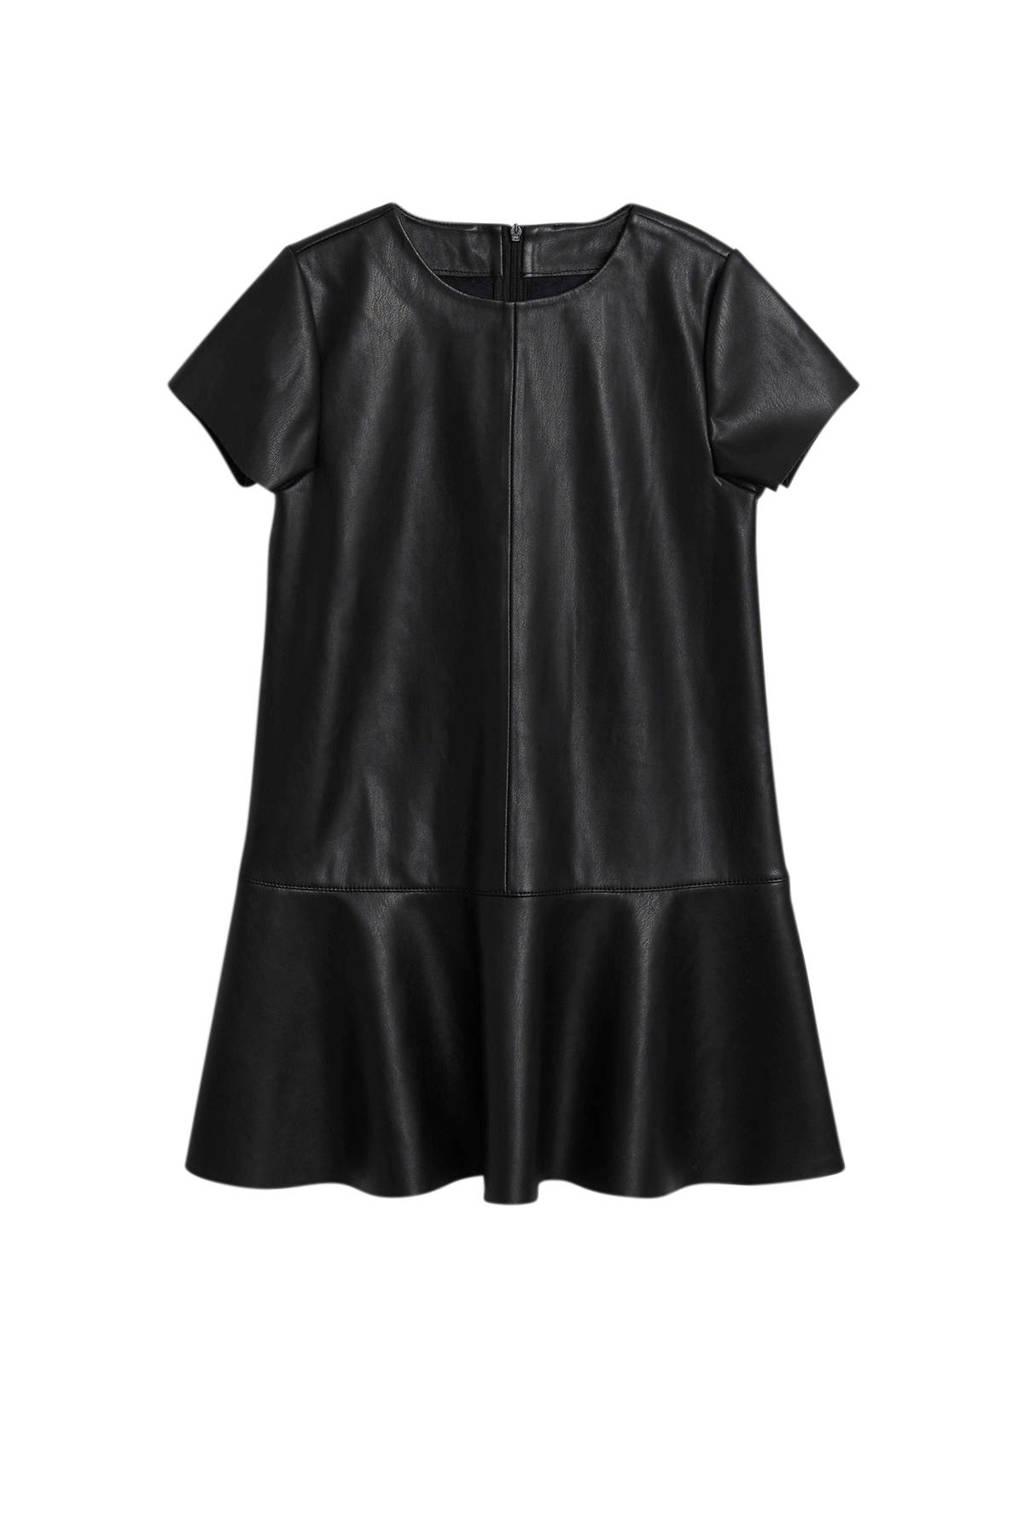 Mango Kids imitatieleren jurk zwart, Zwart